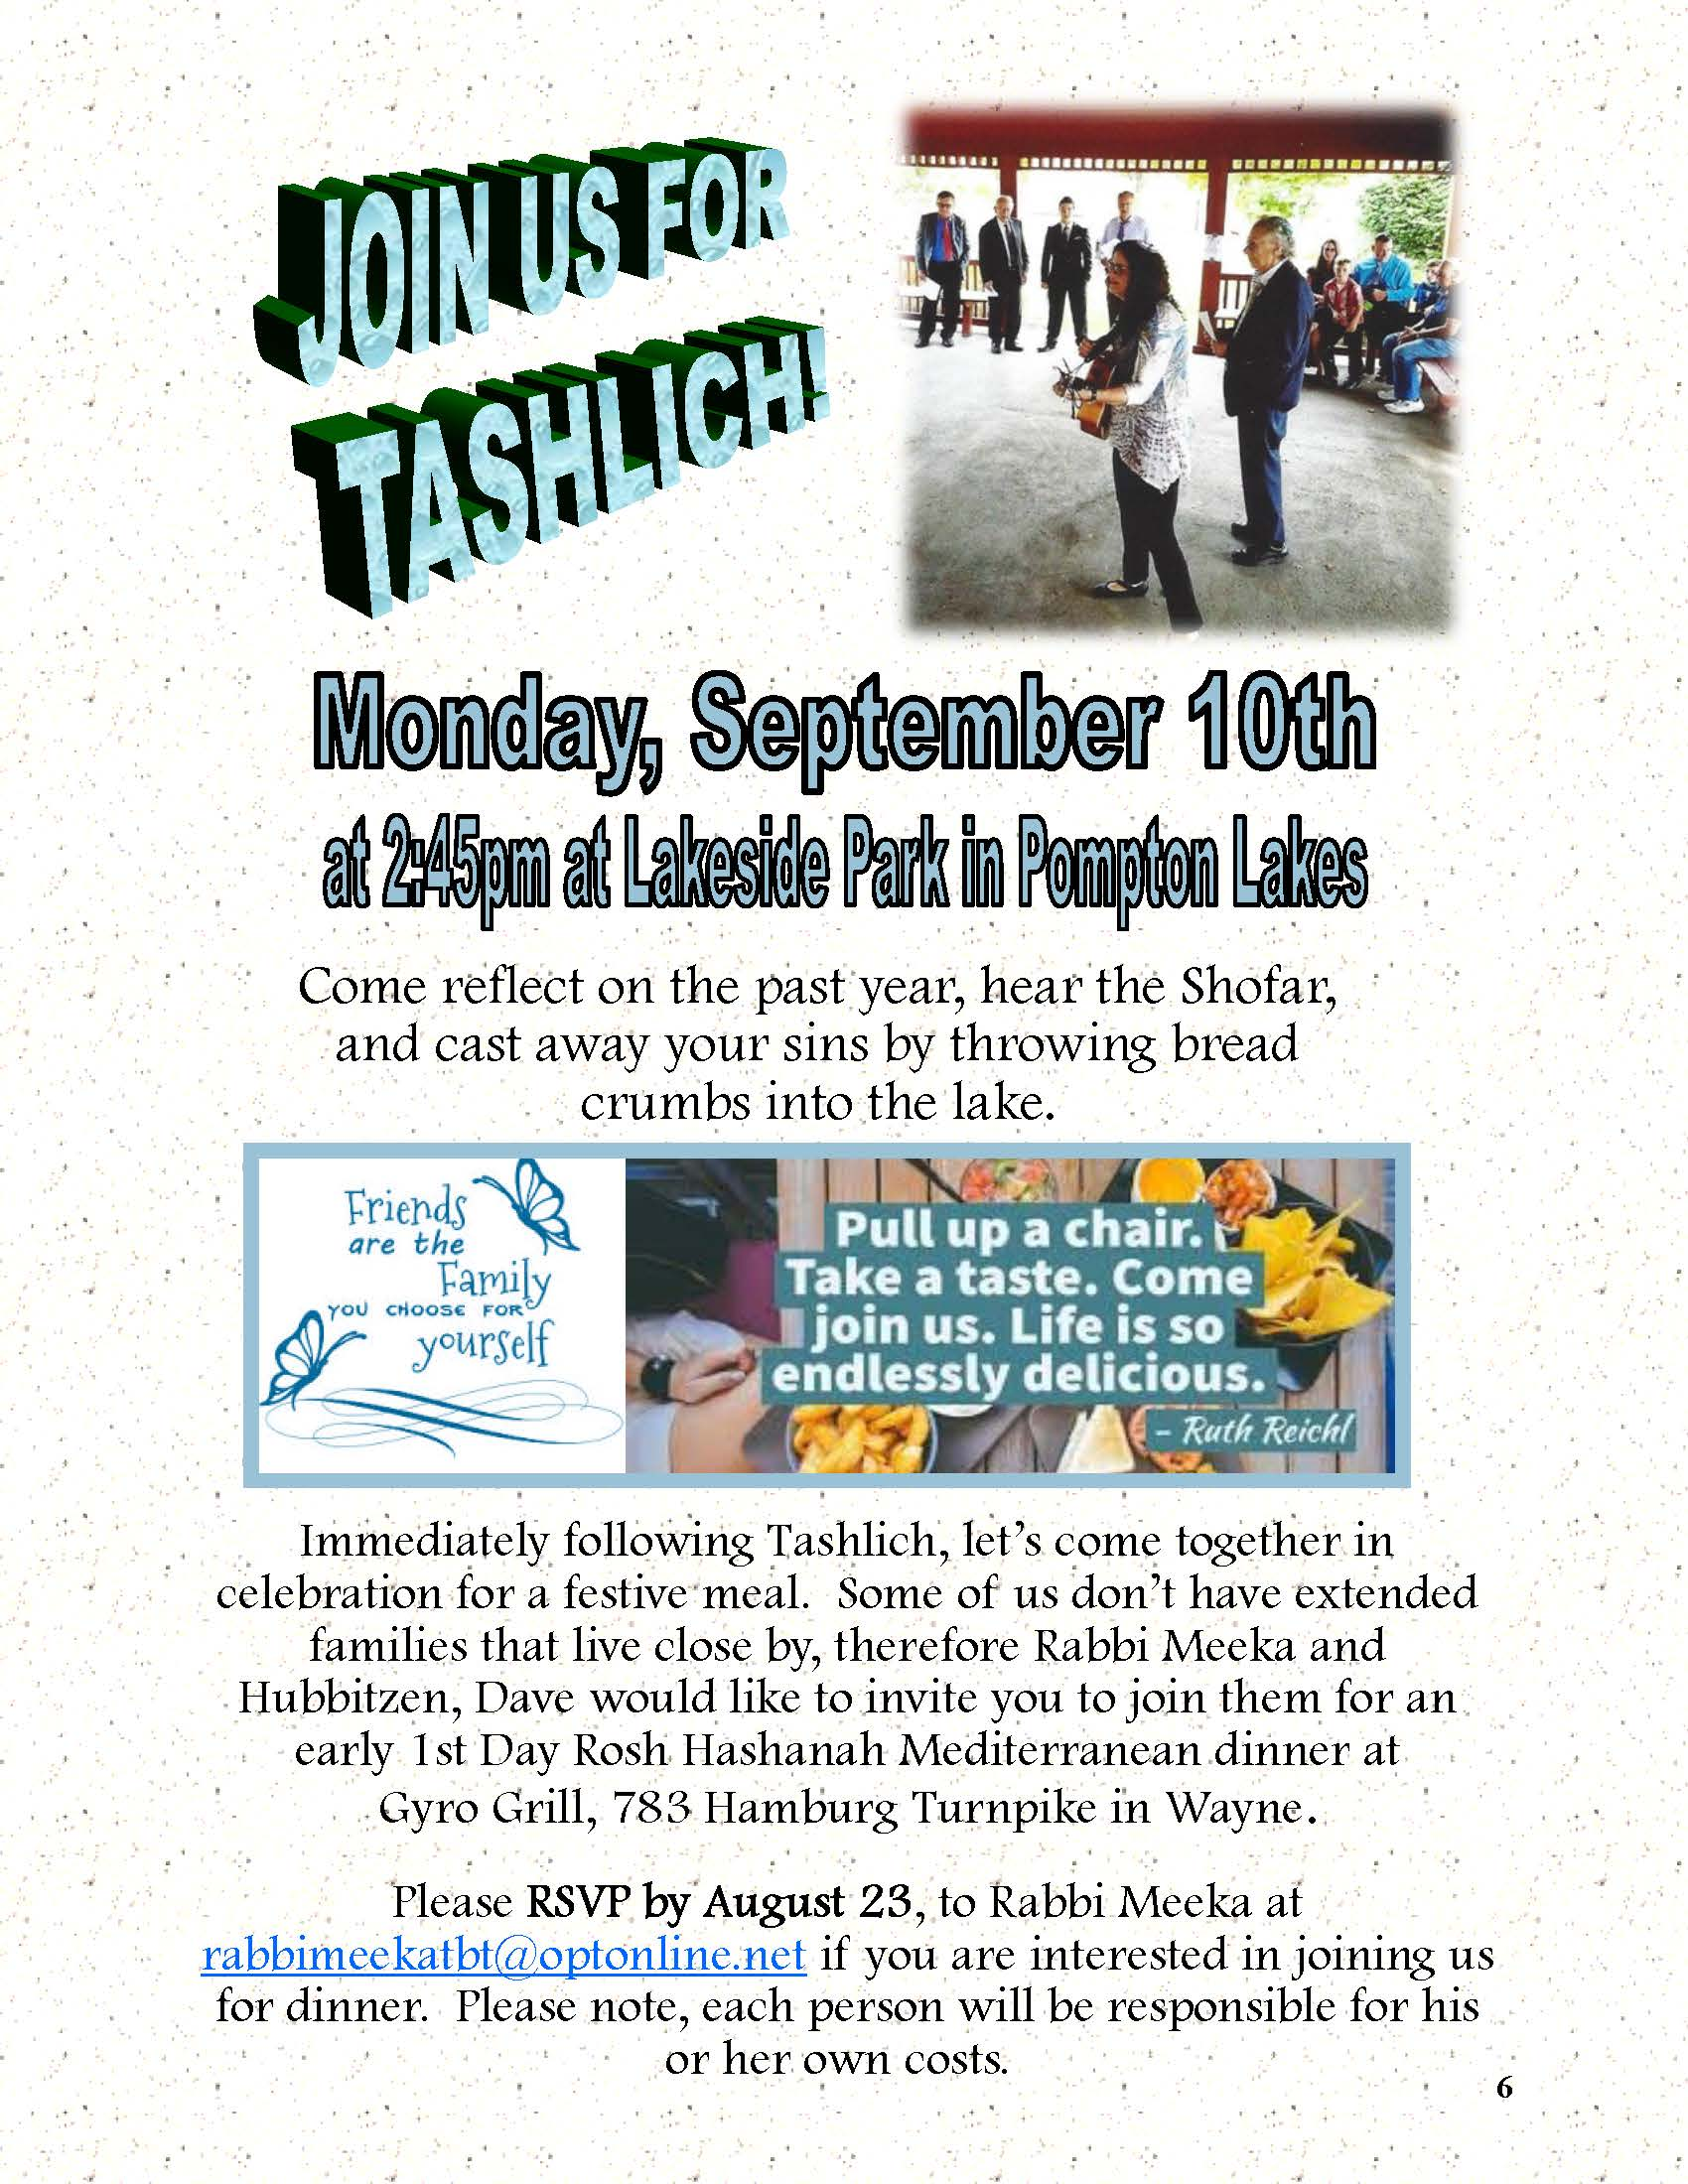 HH #6 - Tashlich-RH Dinner Invite from Rabbi Meeka--2018 (2)